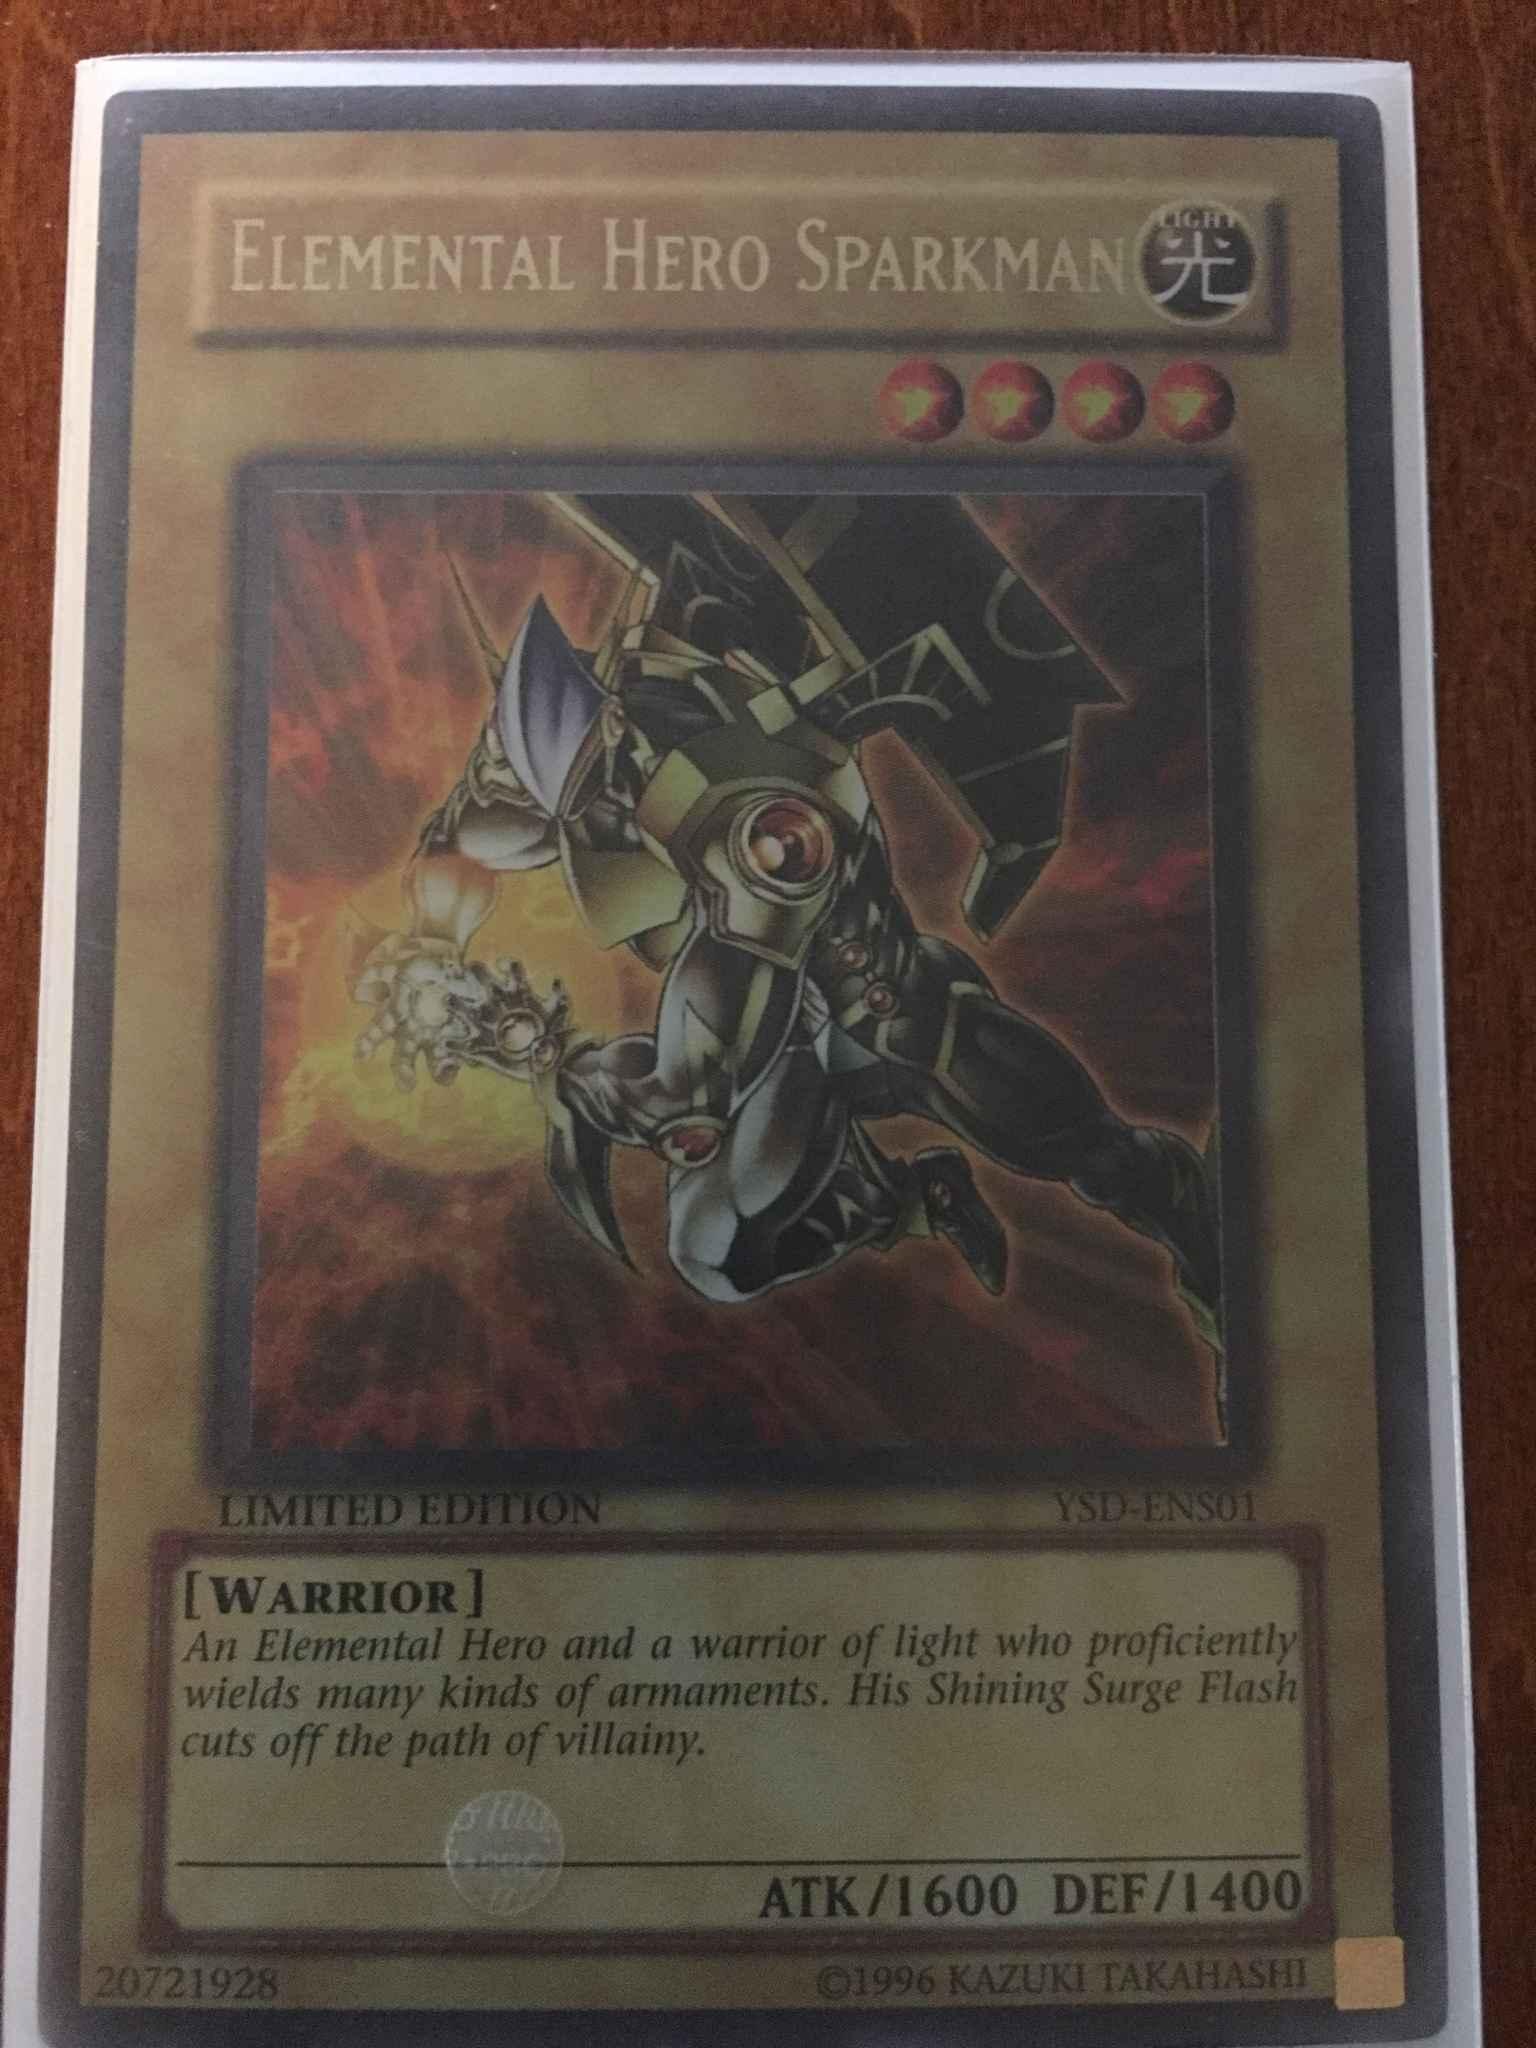 Elemental Hero Sparksman YSD-ENS01 Rare Limited Edition Yugioh Card